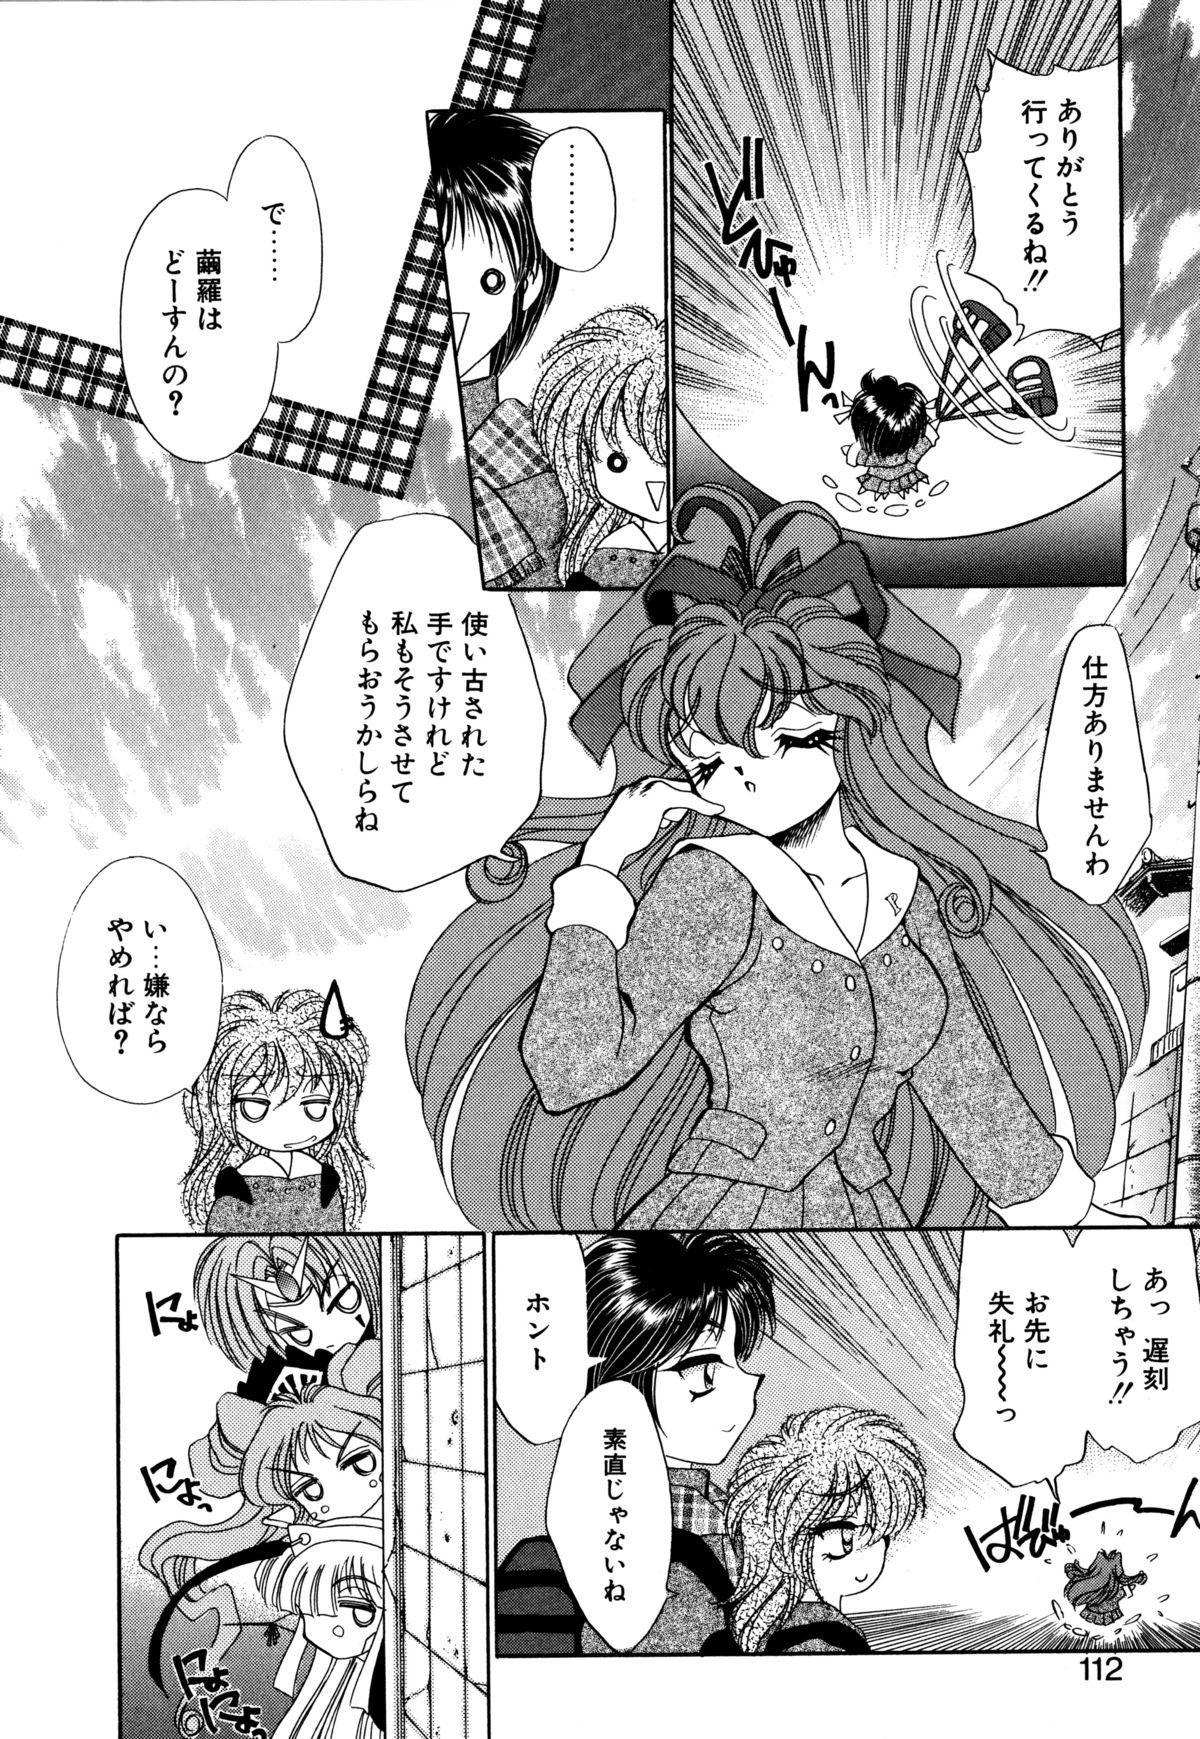 Kigurumi Sentai Quiltian 110